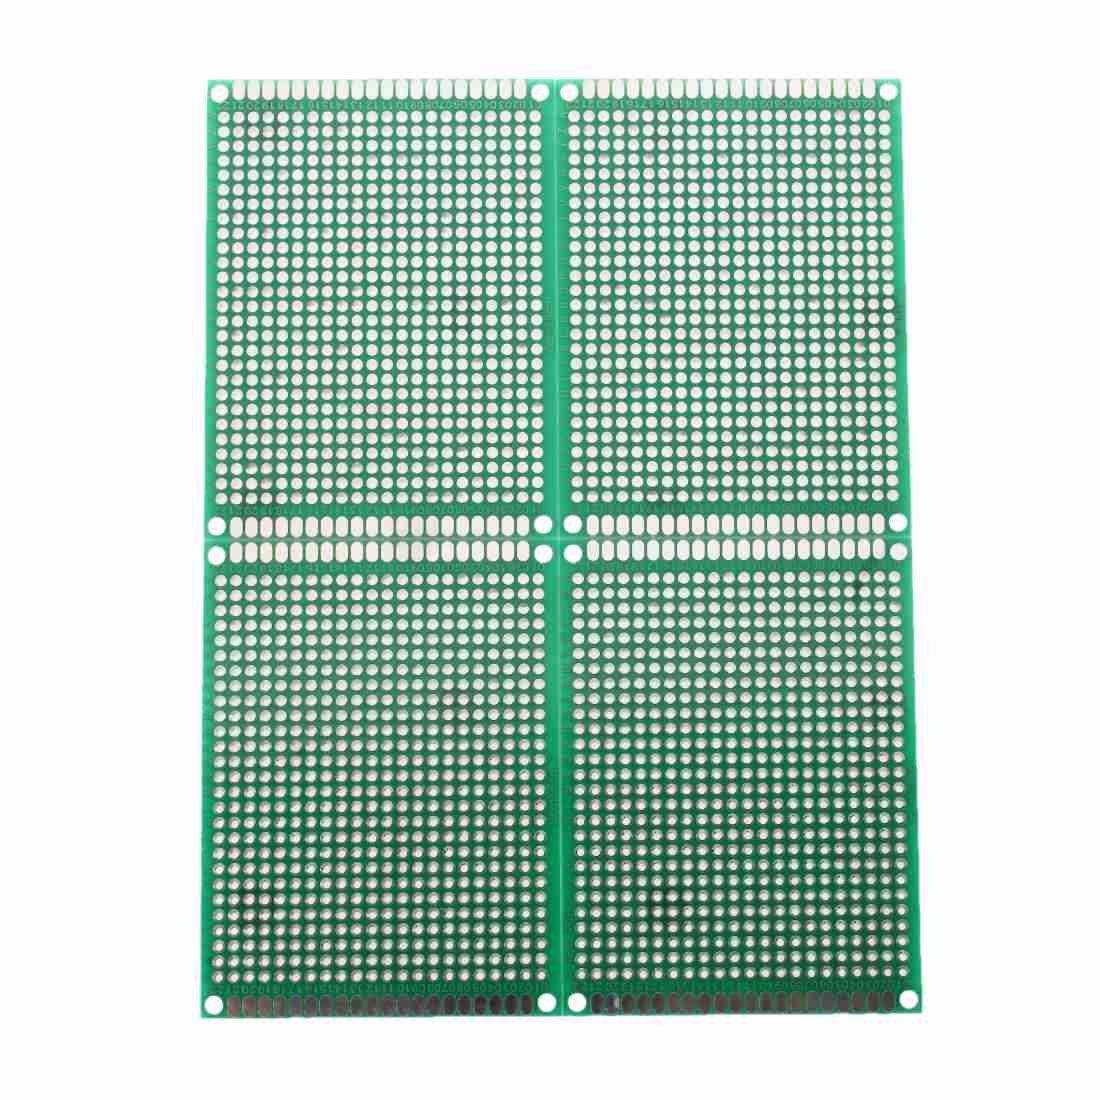 SODIAL(R) 4pcs Doble-Lado Prototipo FR-4 PCB Stripboard universal Placa de circuito impreso 6 * 8cm Tamano SHOMAGT12507